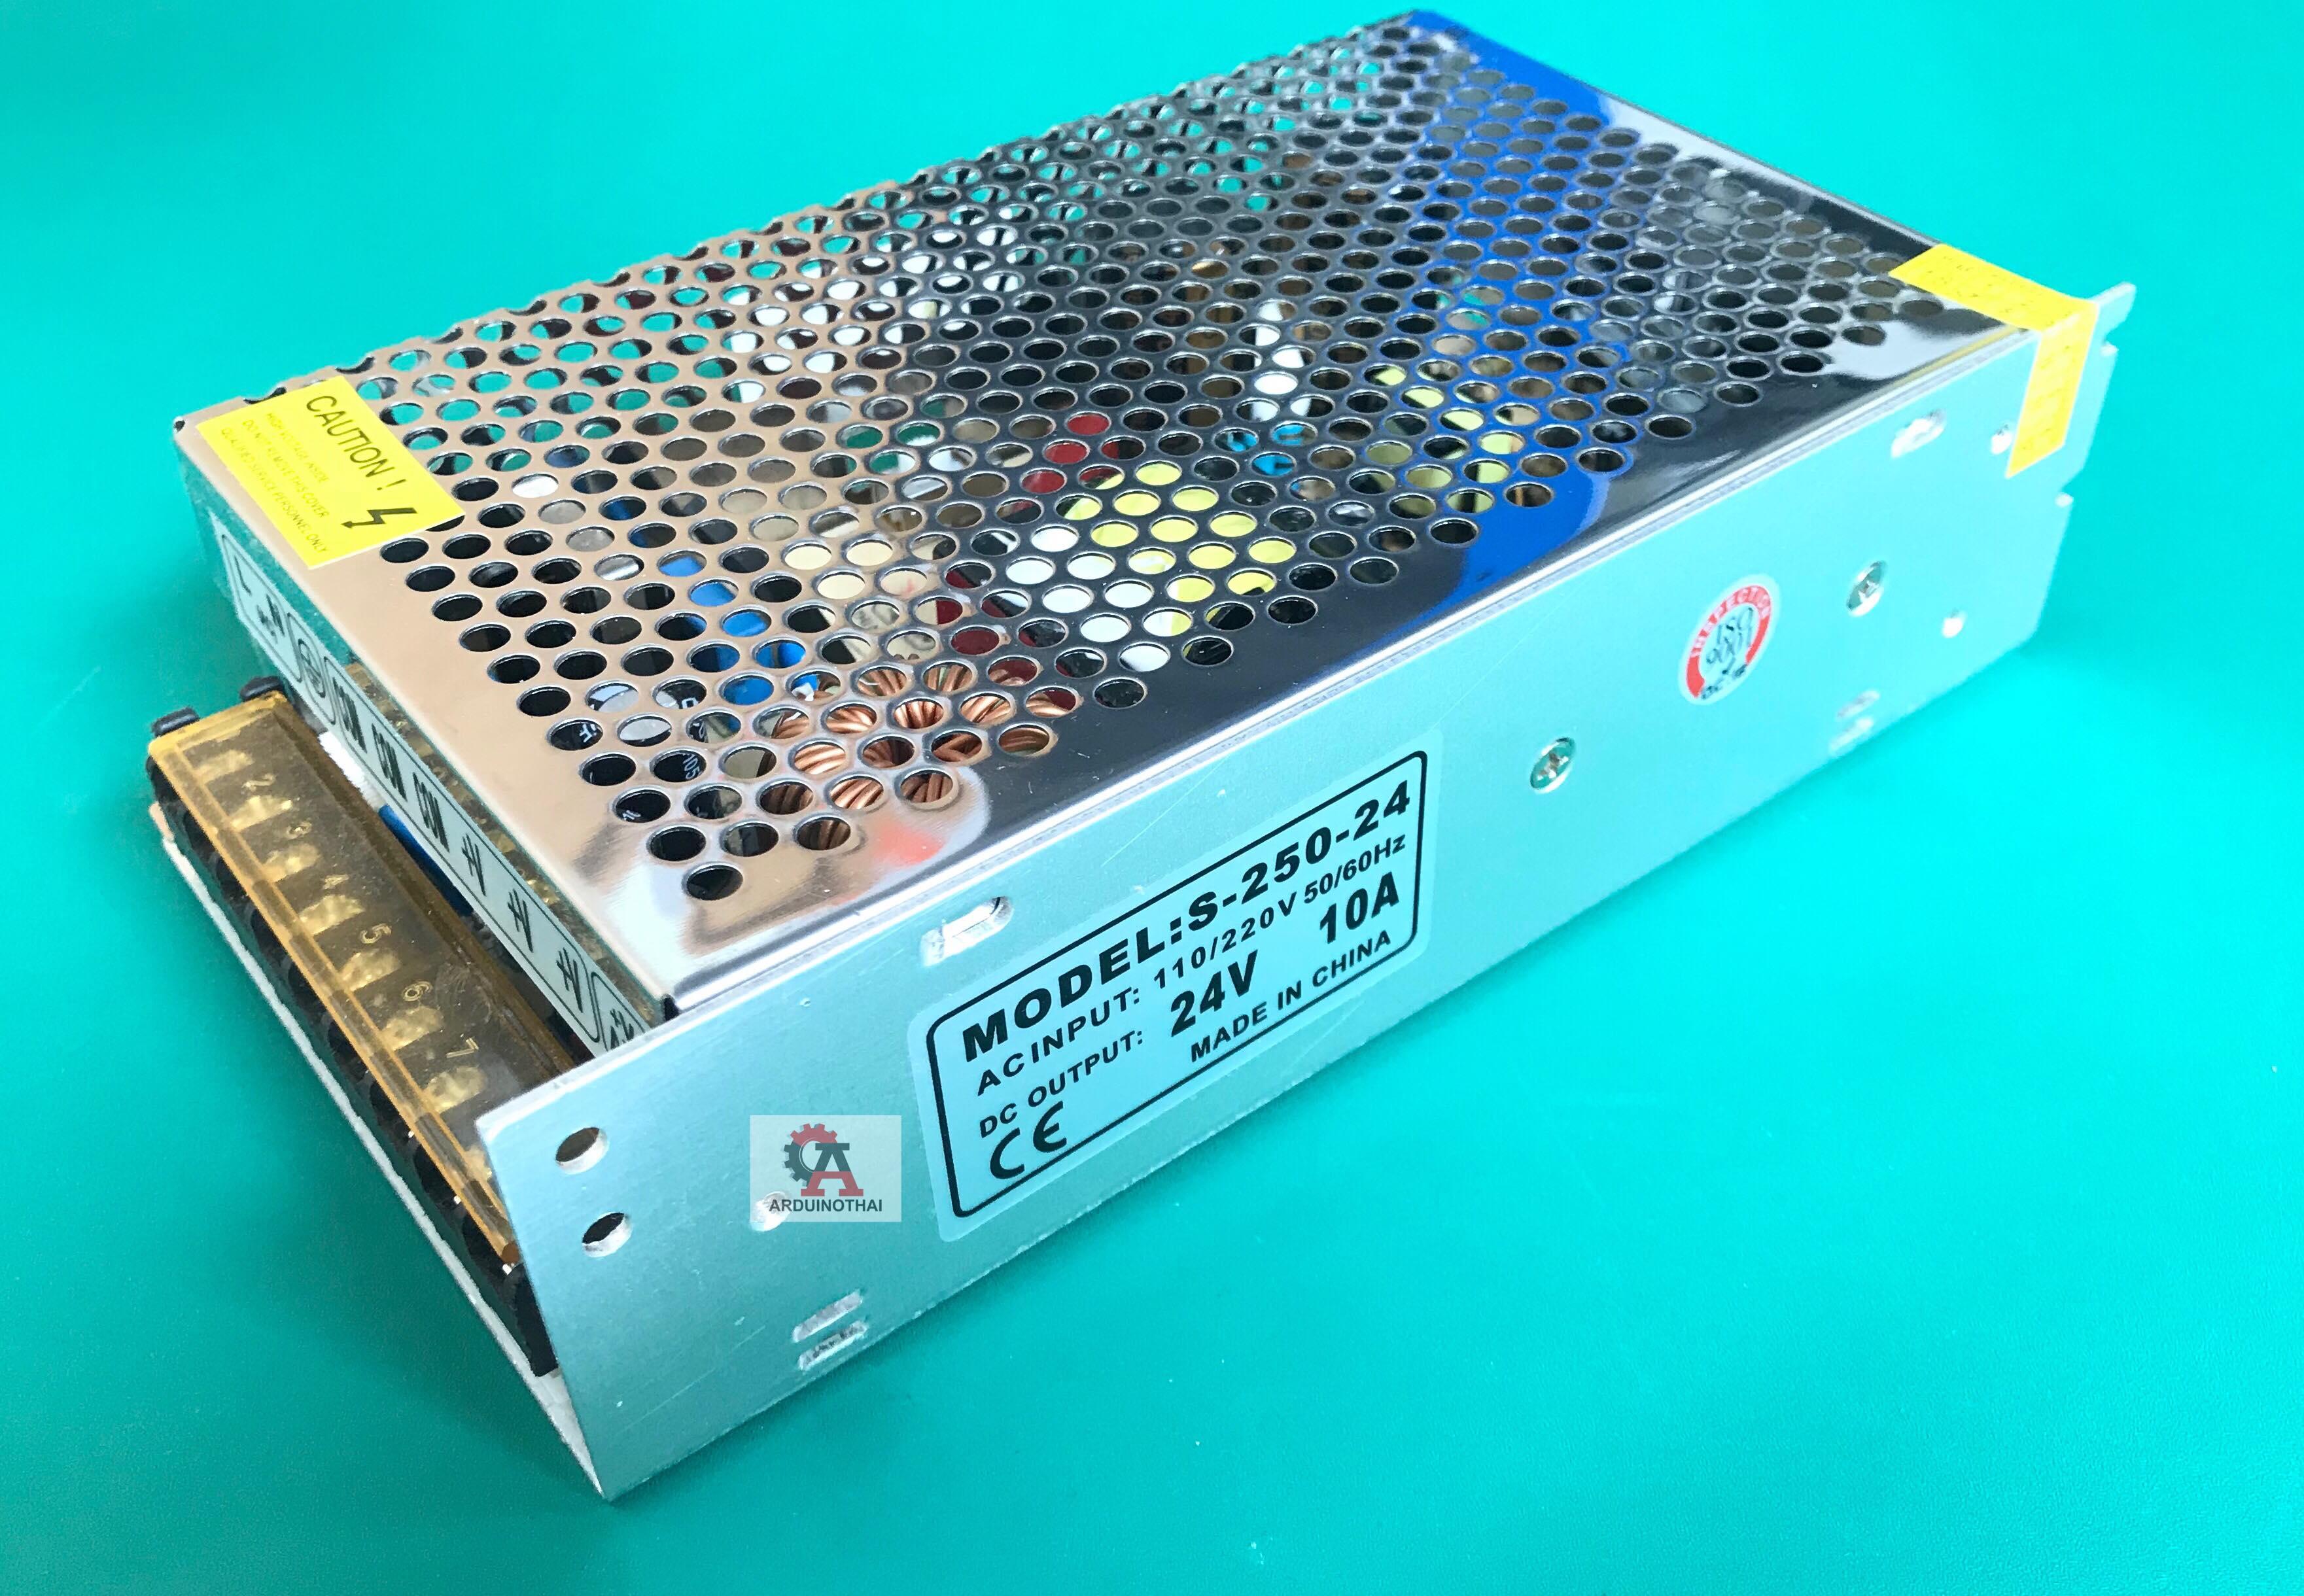 Switching 24V 10A แหล่งจ่ายไฟ 24V 10A